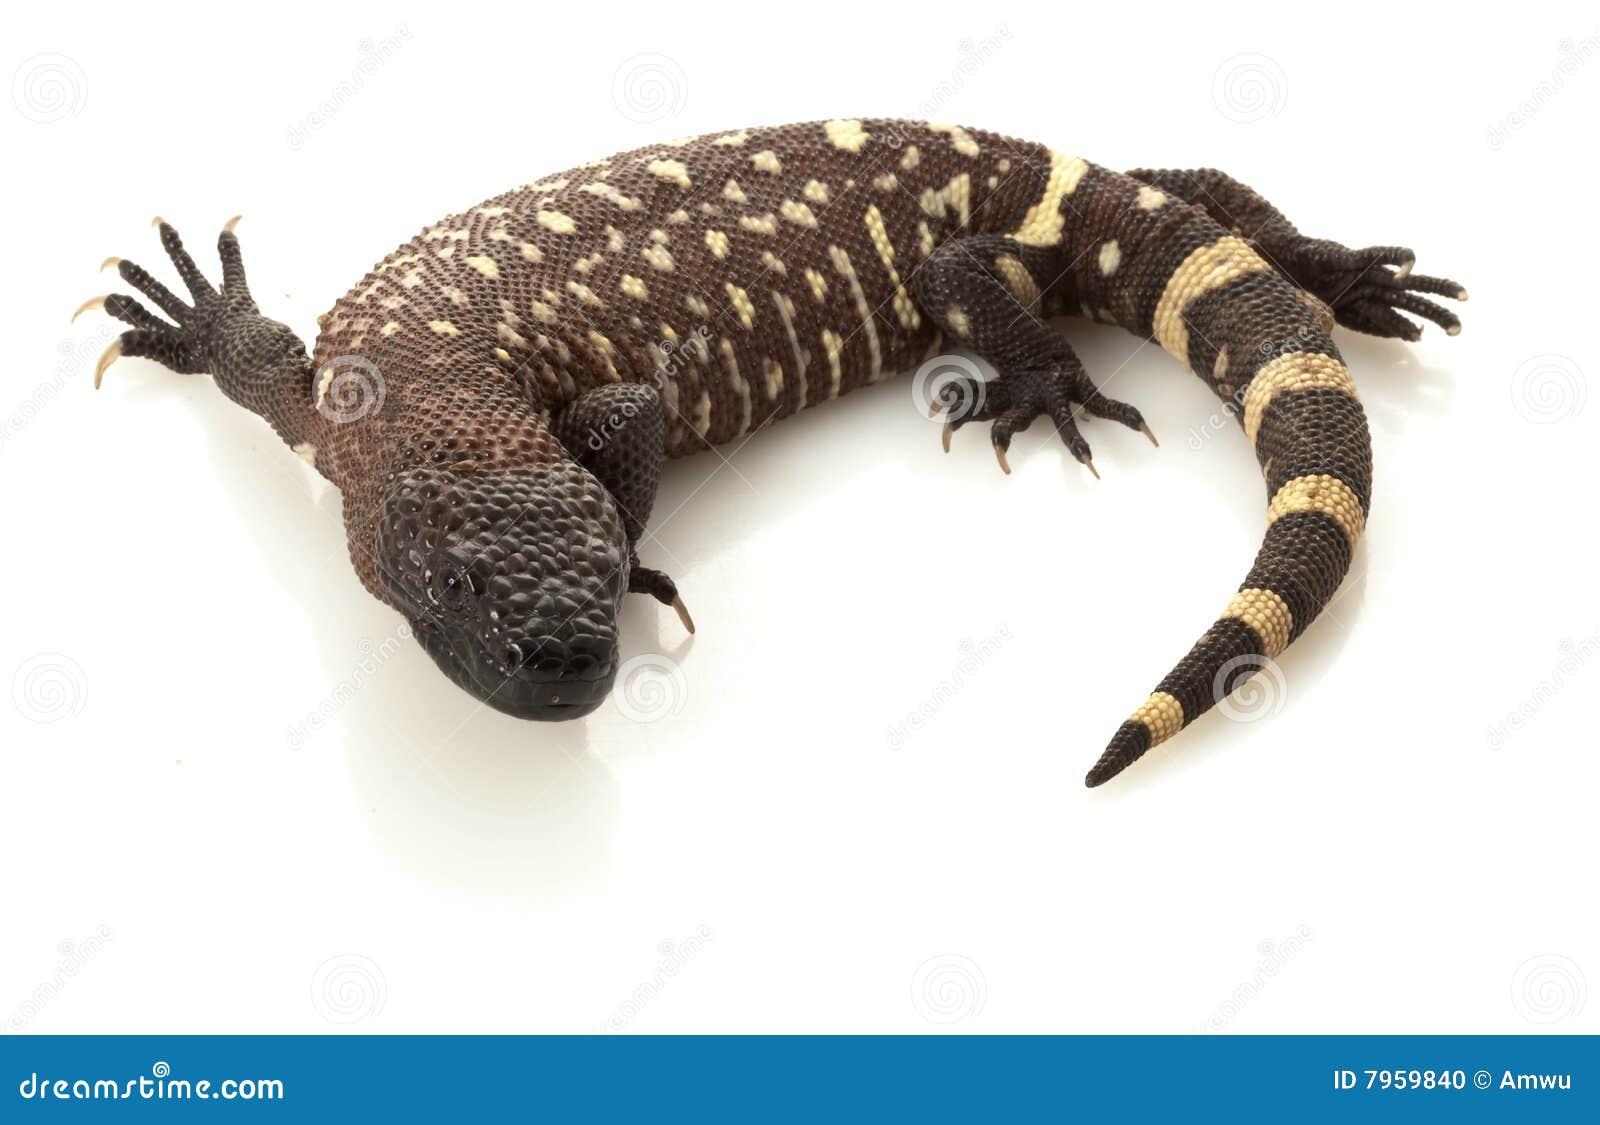 Mexican Beaded Lizard Stock Photo Image 7959840